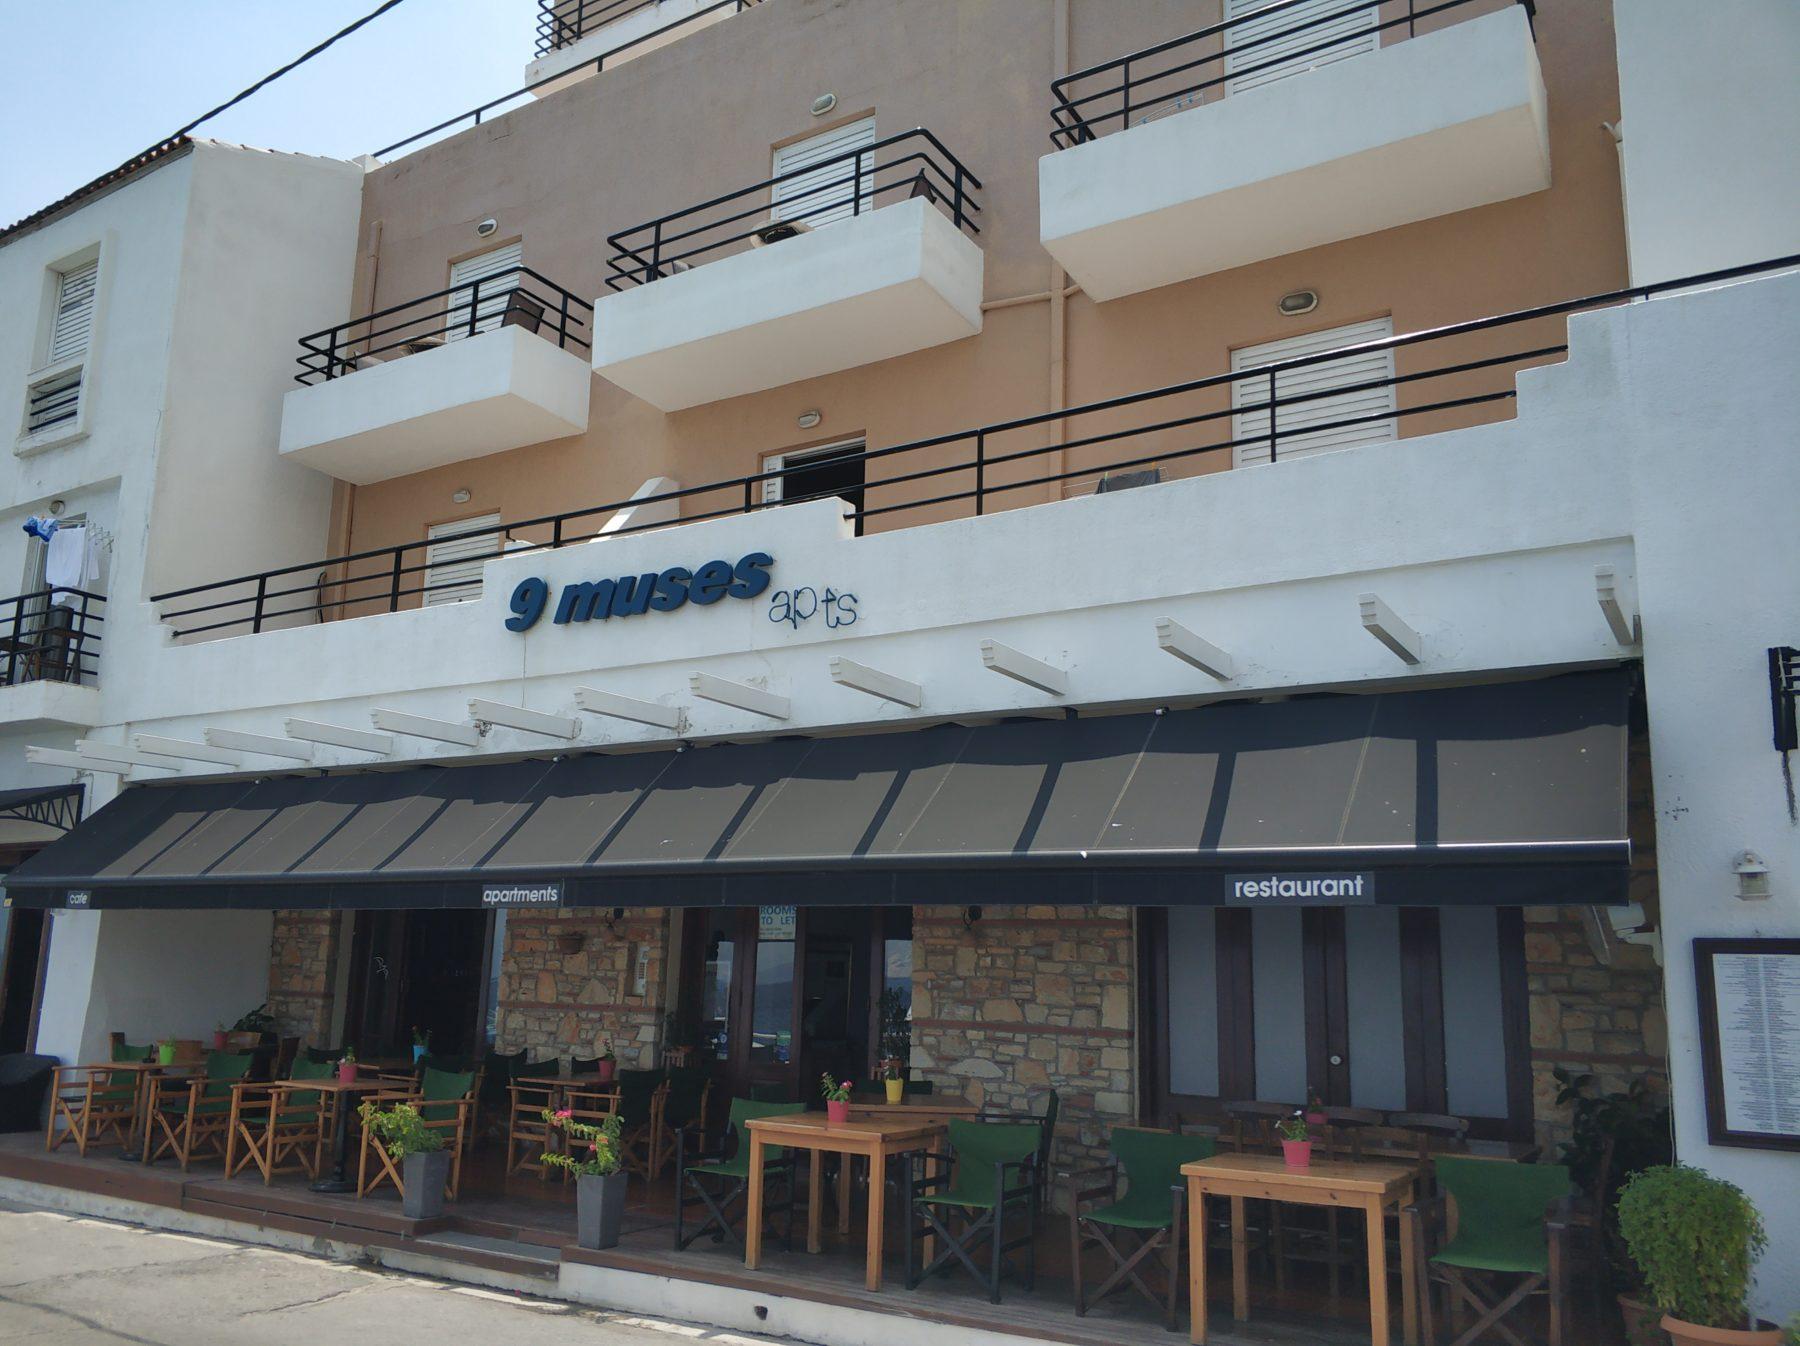 9 Muses  Apartments – Restaurant